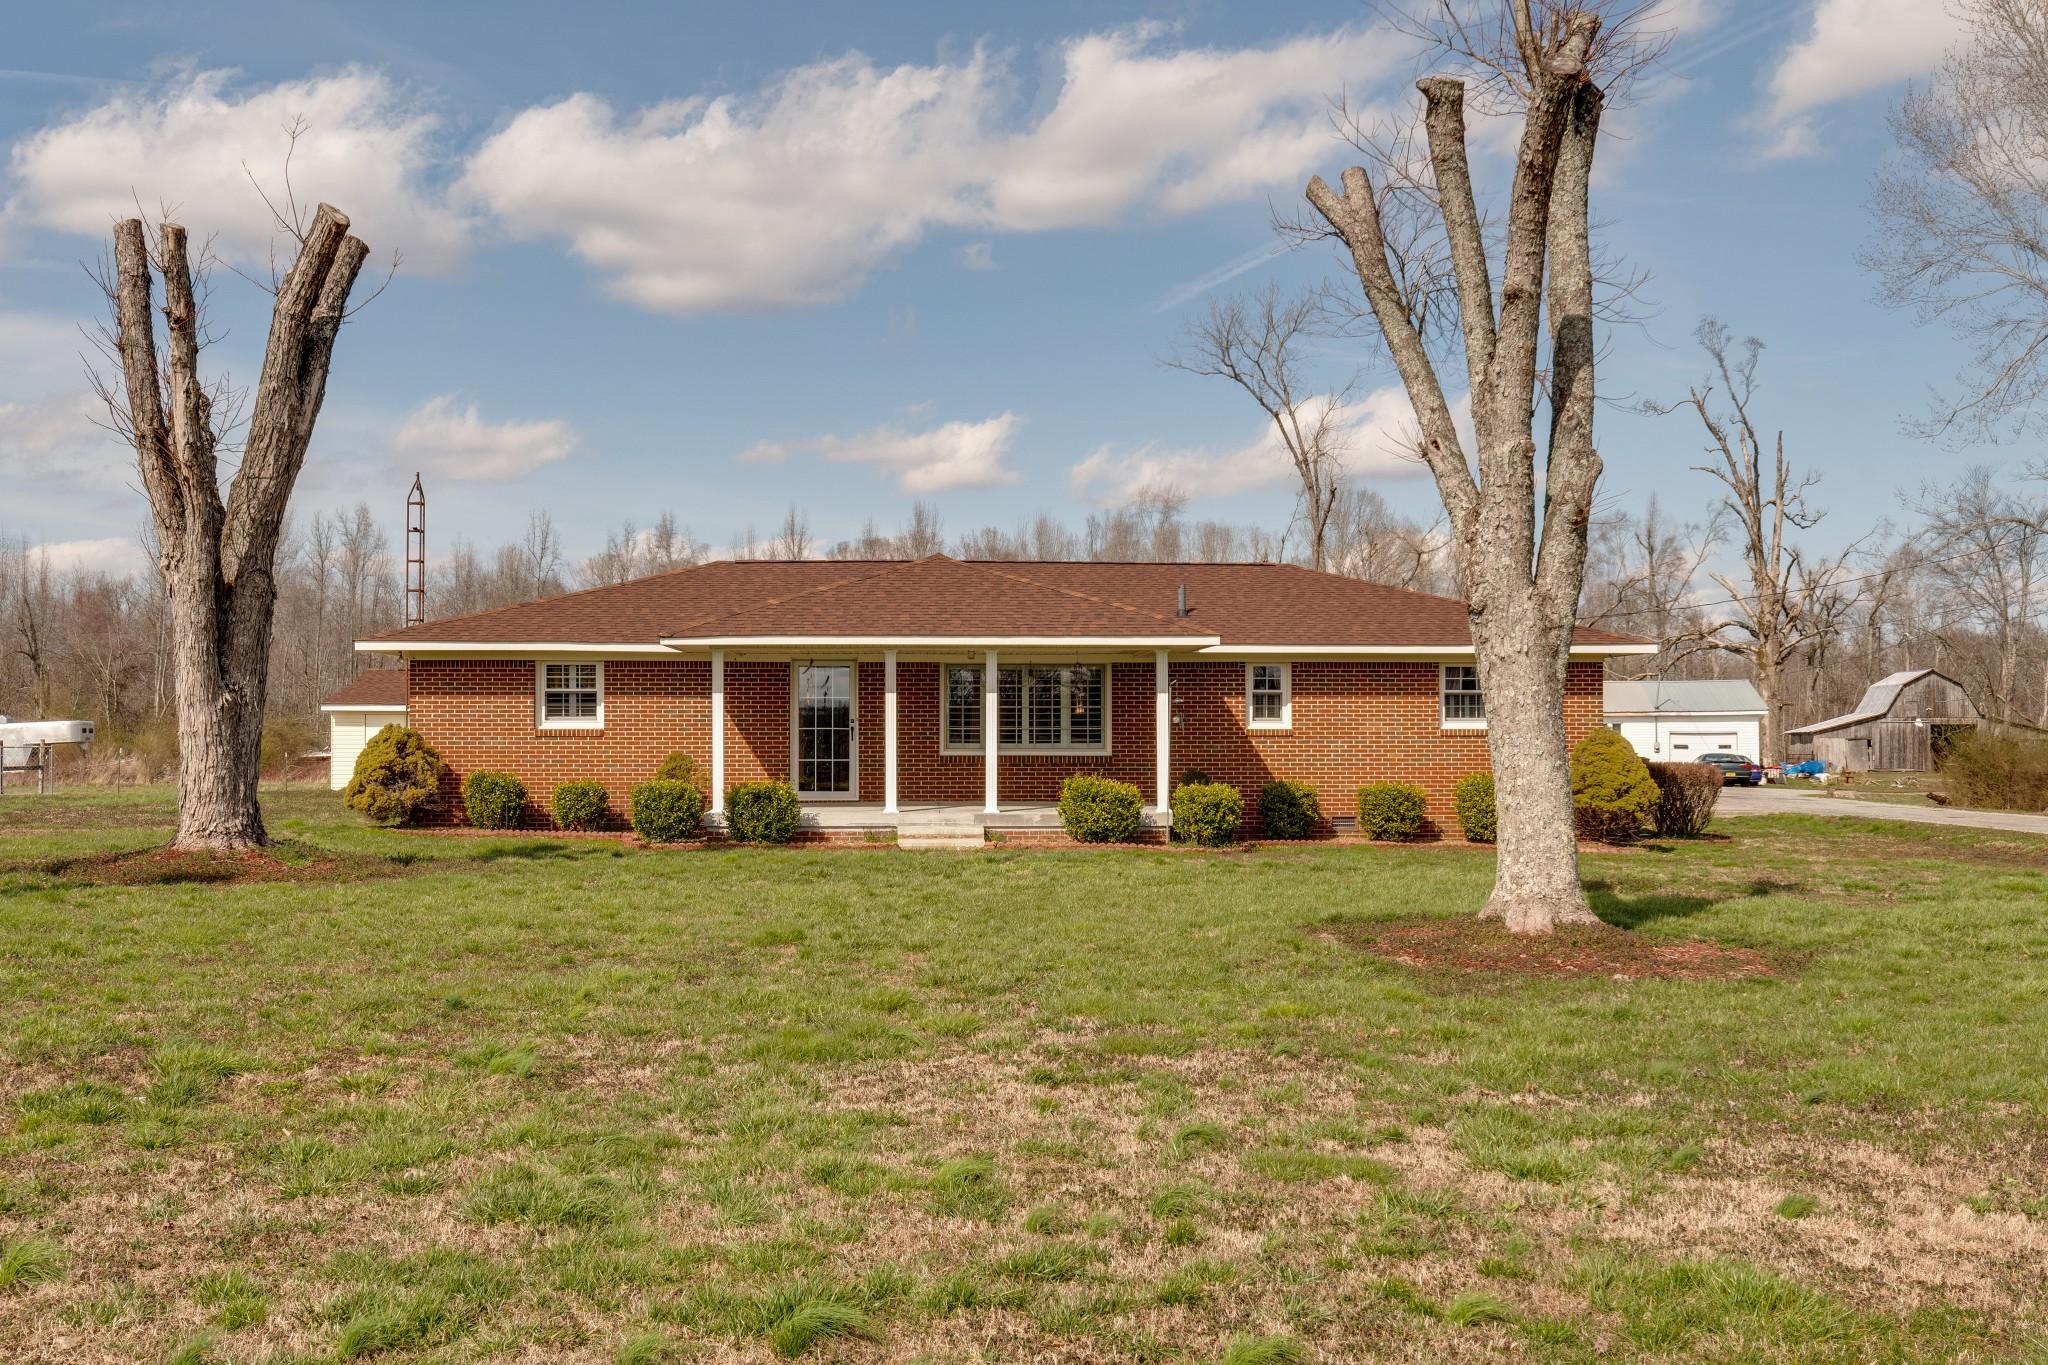 171 Roy Walls Rd, Decherd, TN 37324 - Decherd, TN real estate listing